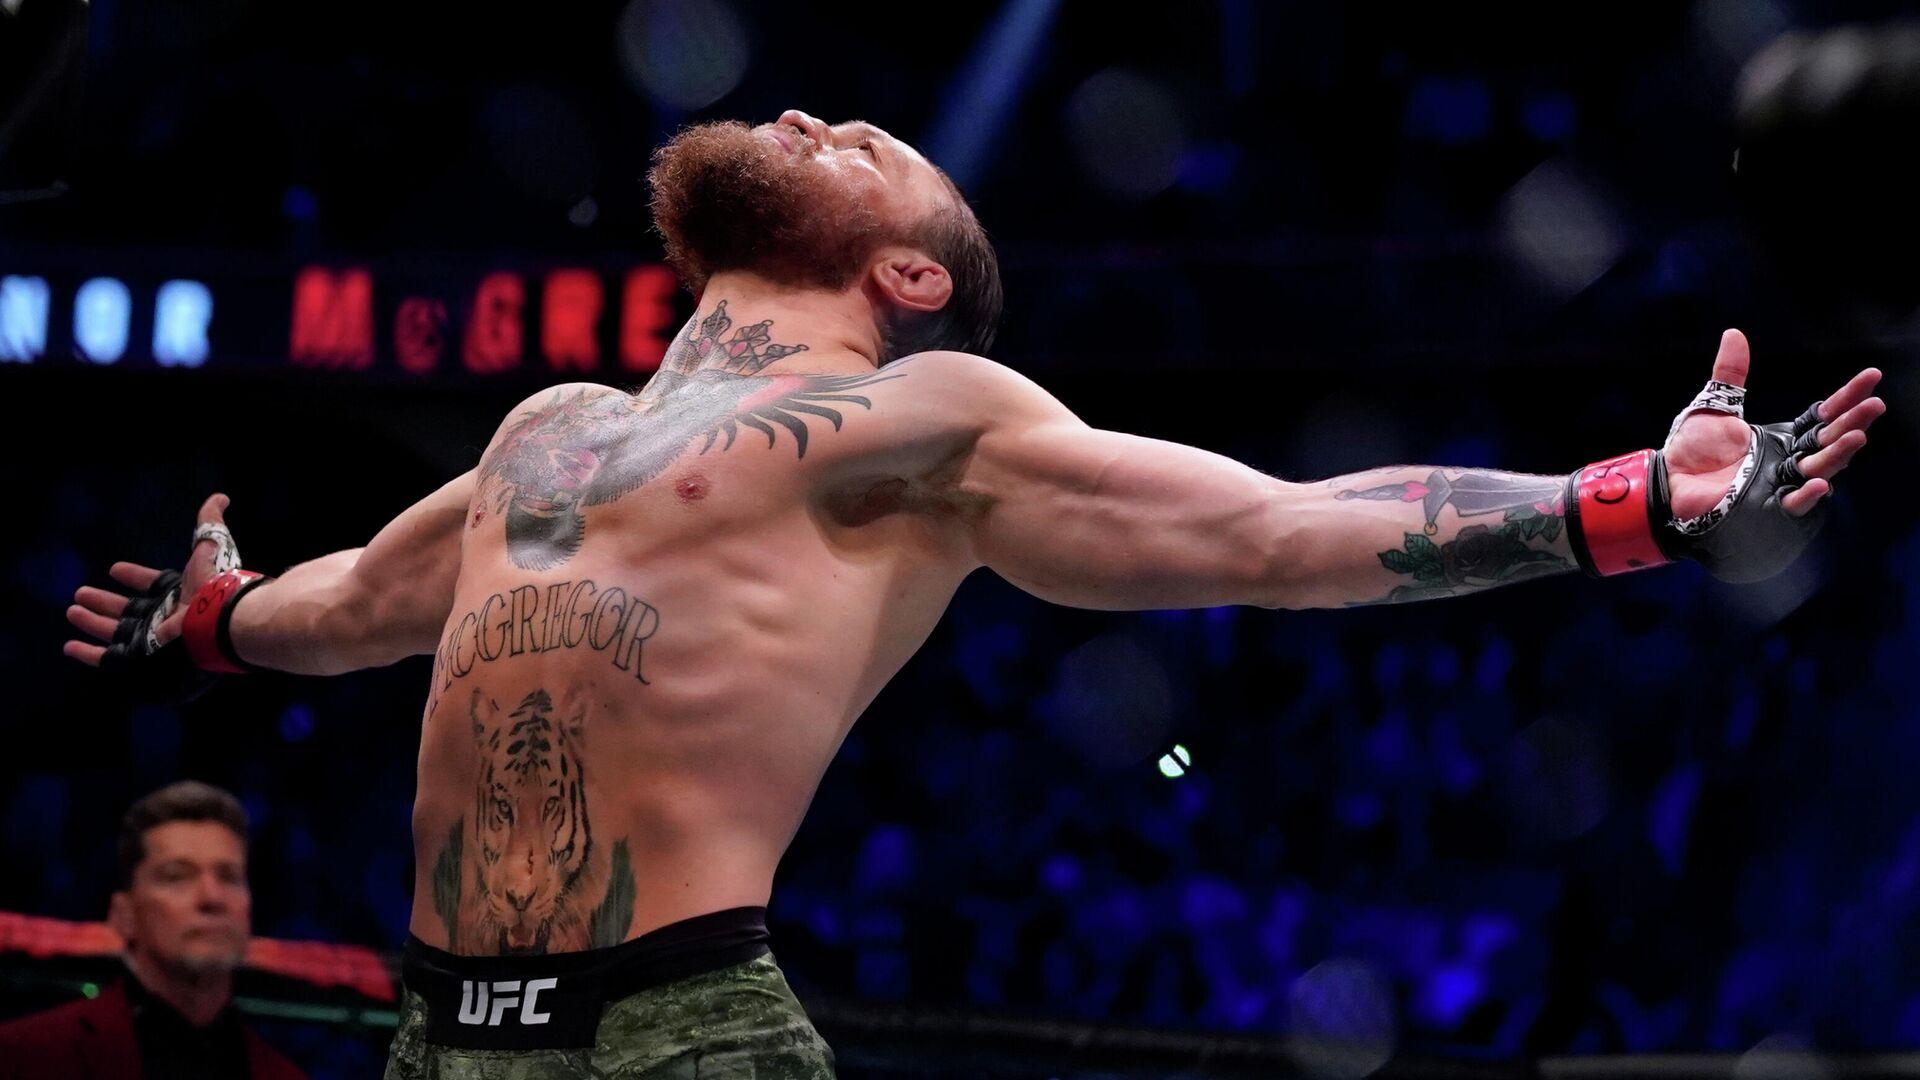 Боец UFC Конор Макгрегор - РИА Новости, 1920, 23.11.2020